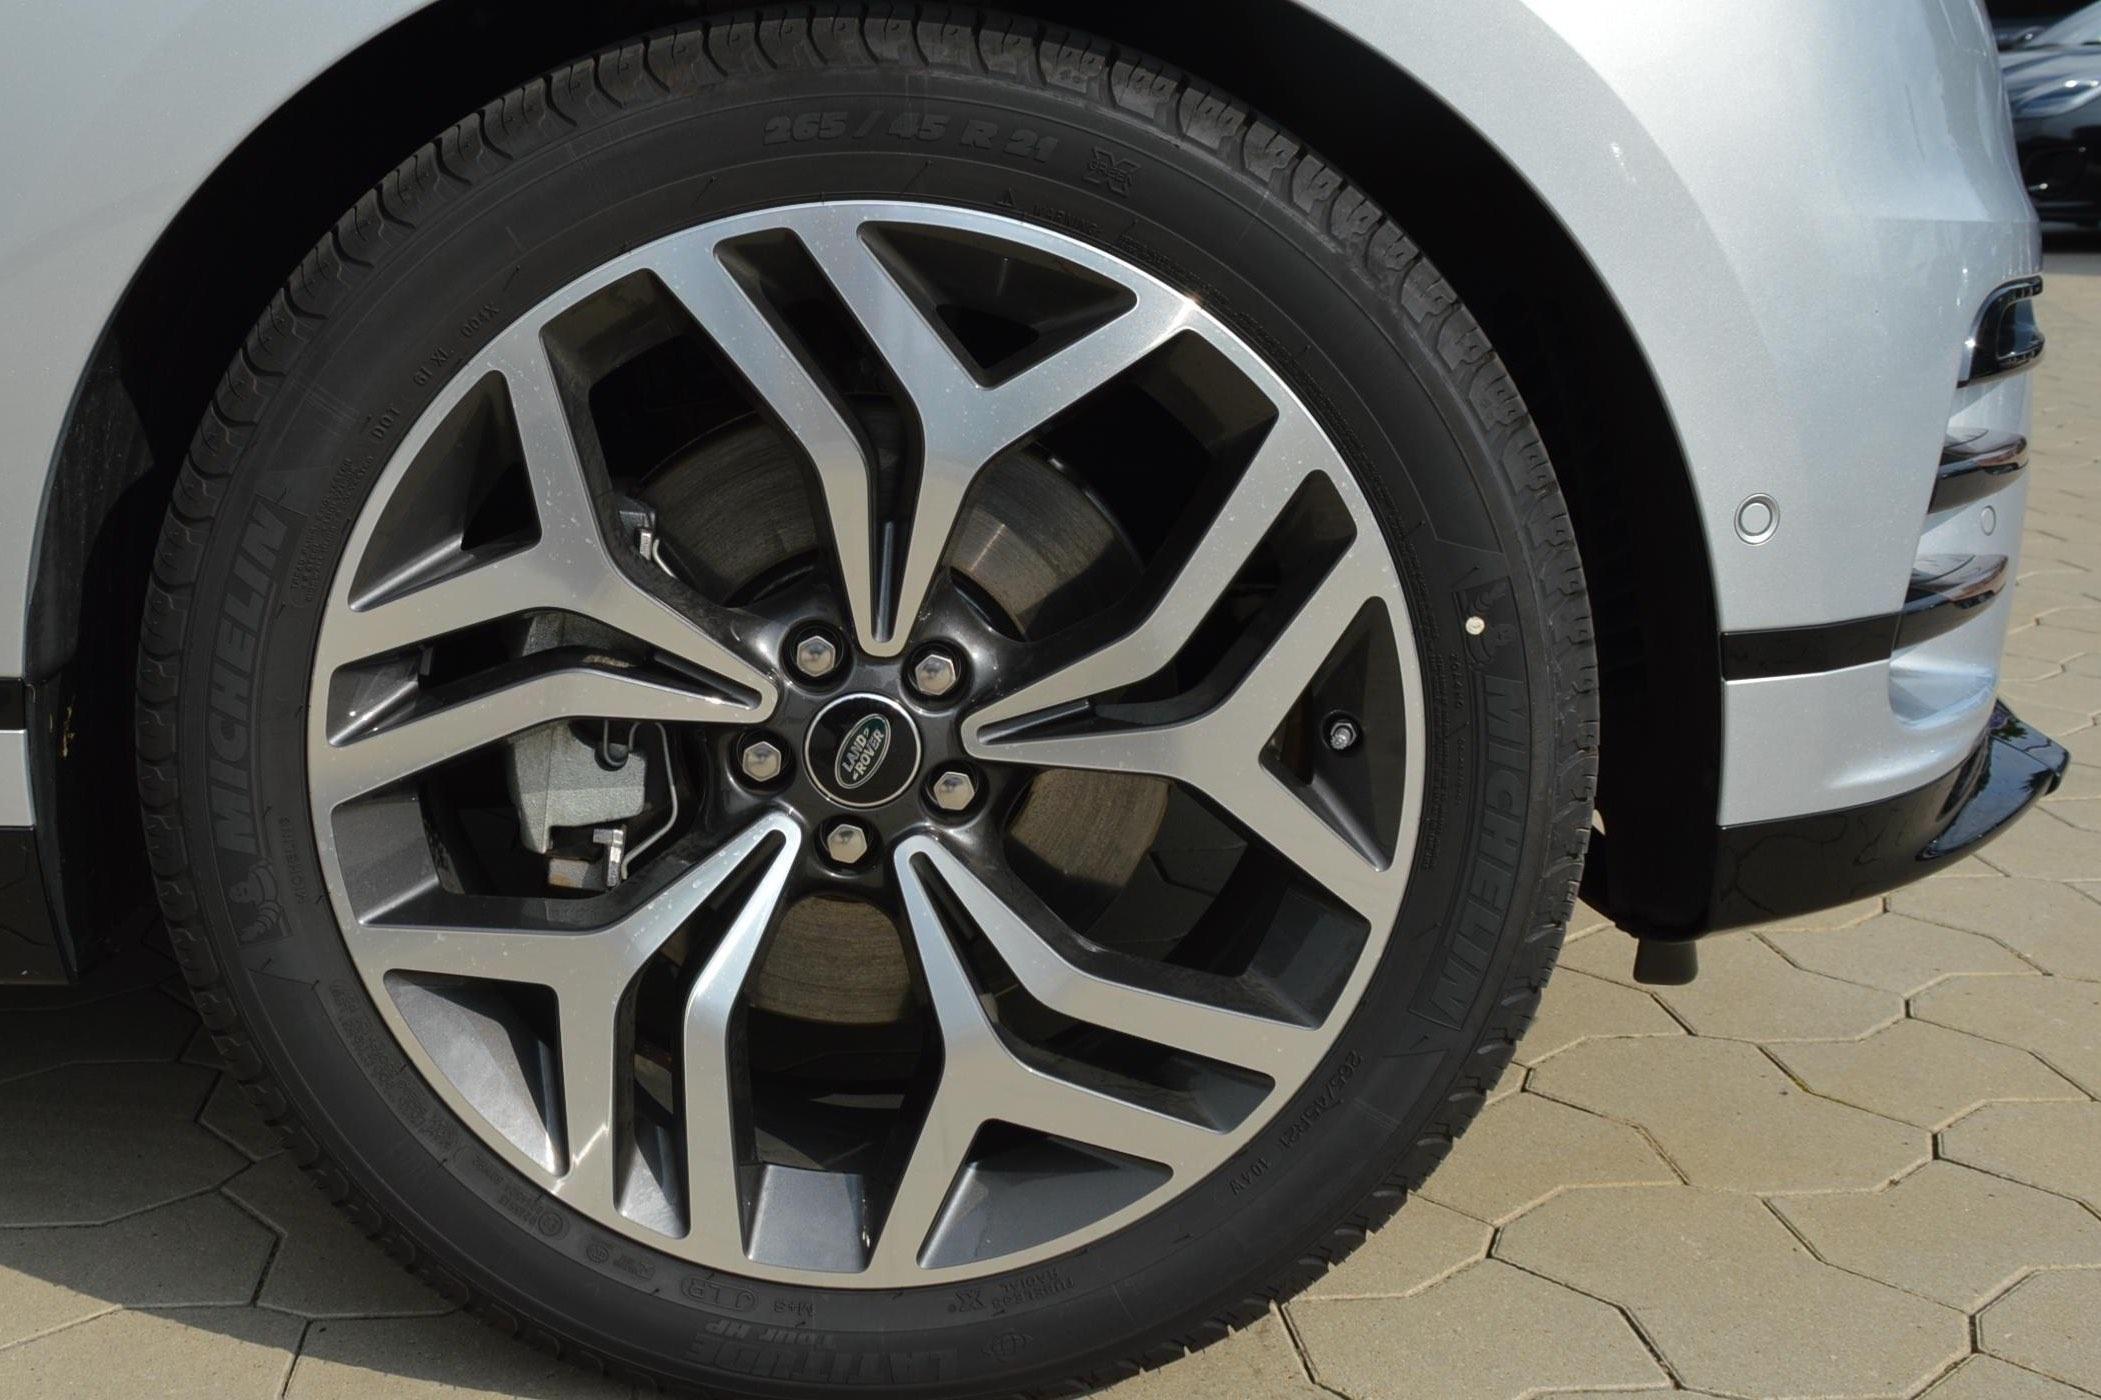 Range Rover 5047 rims